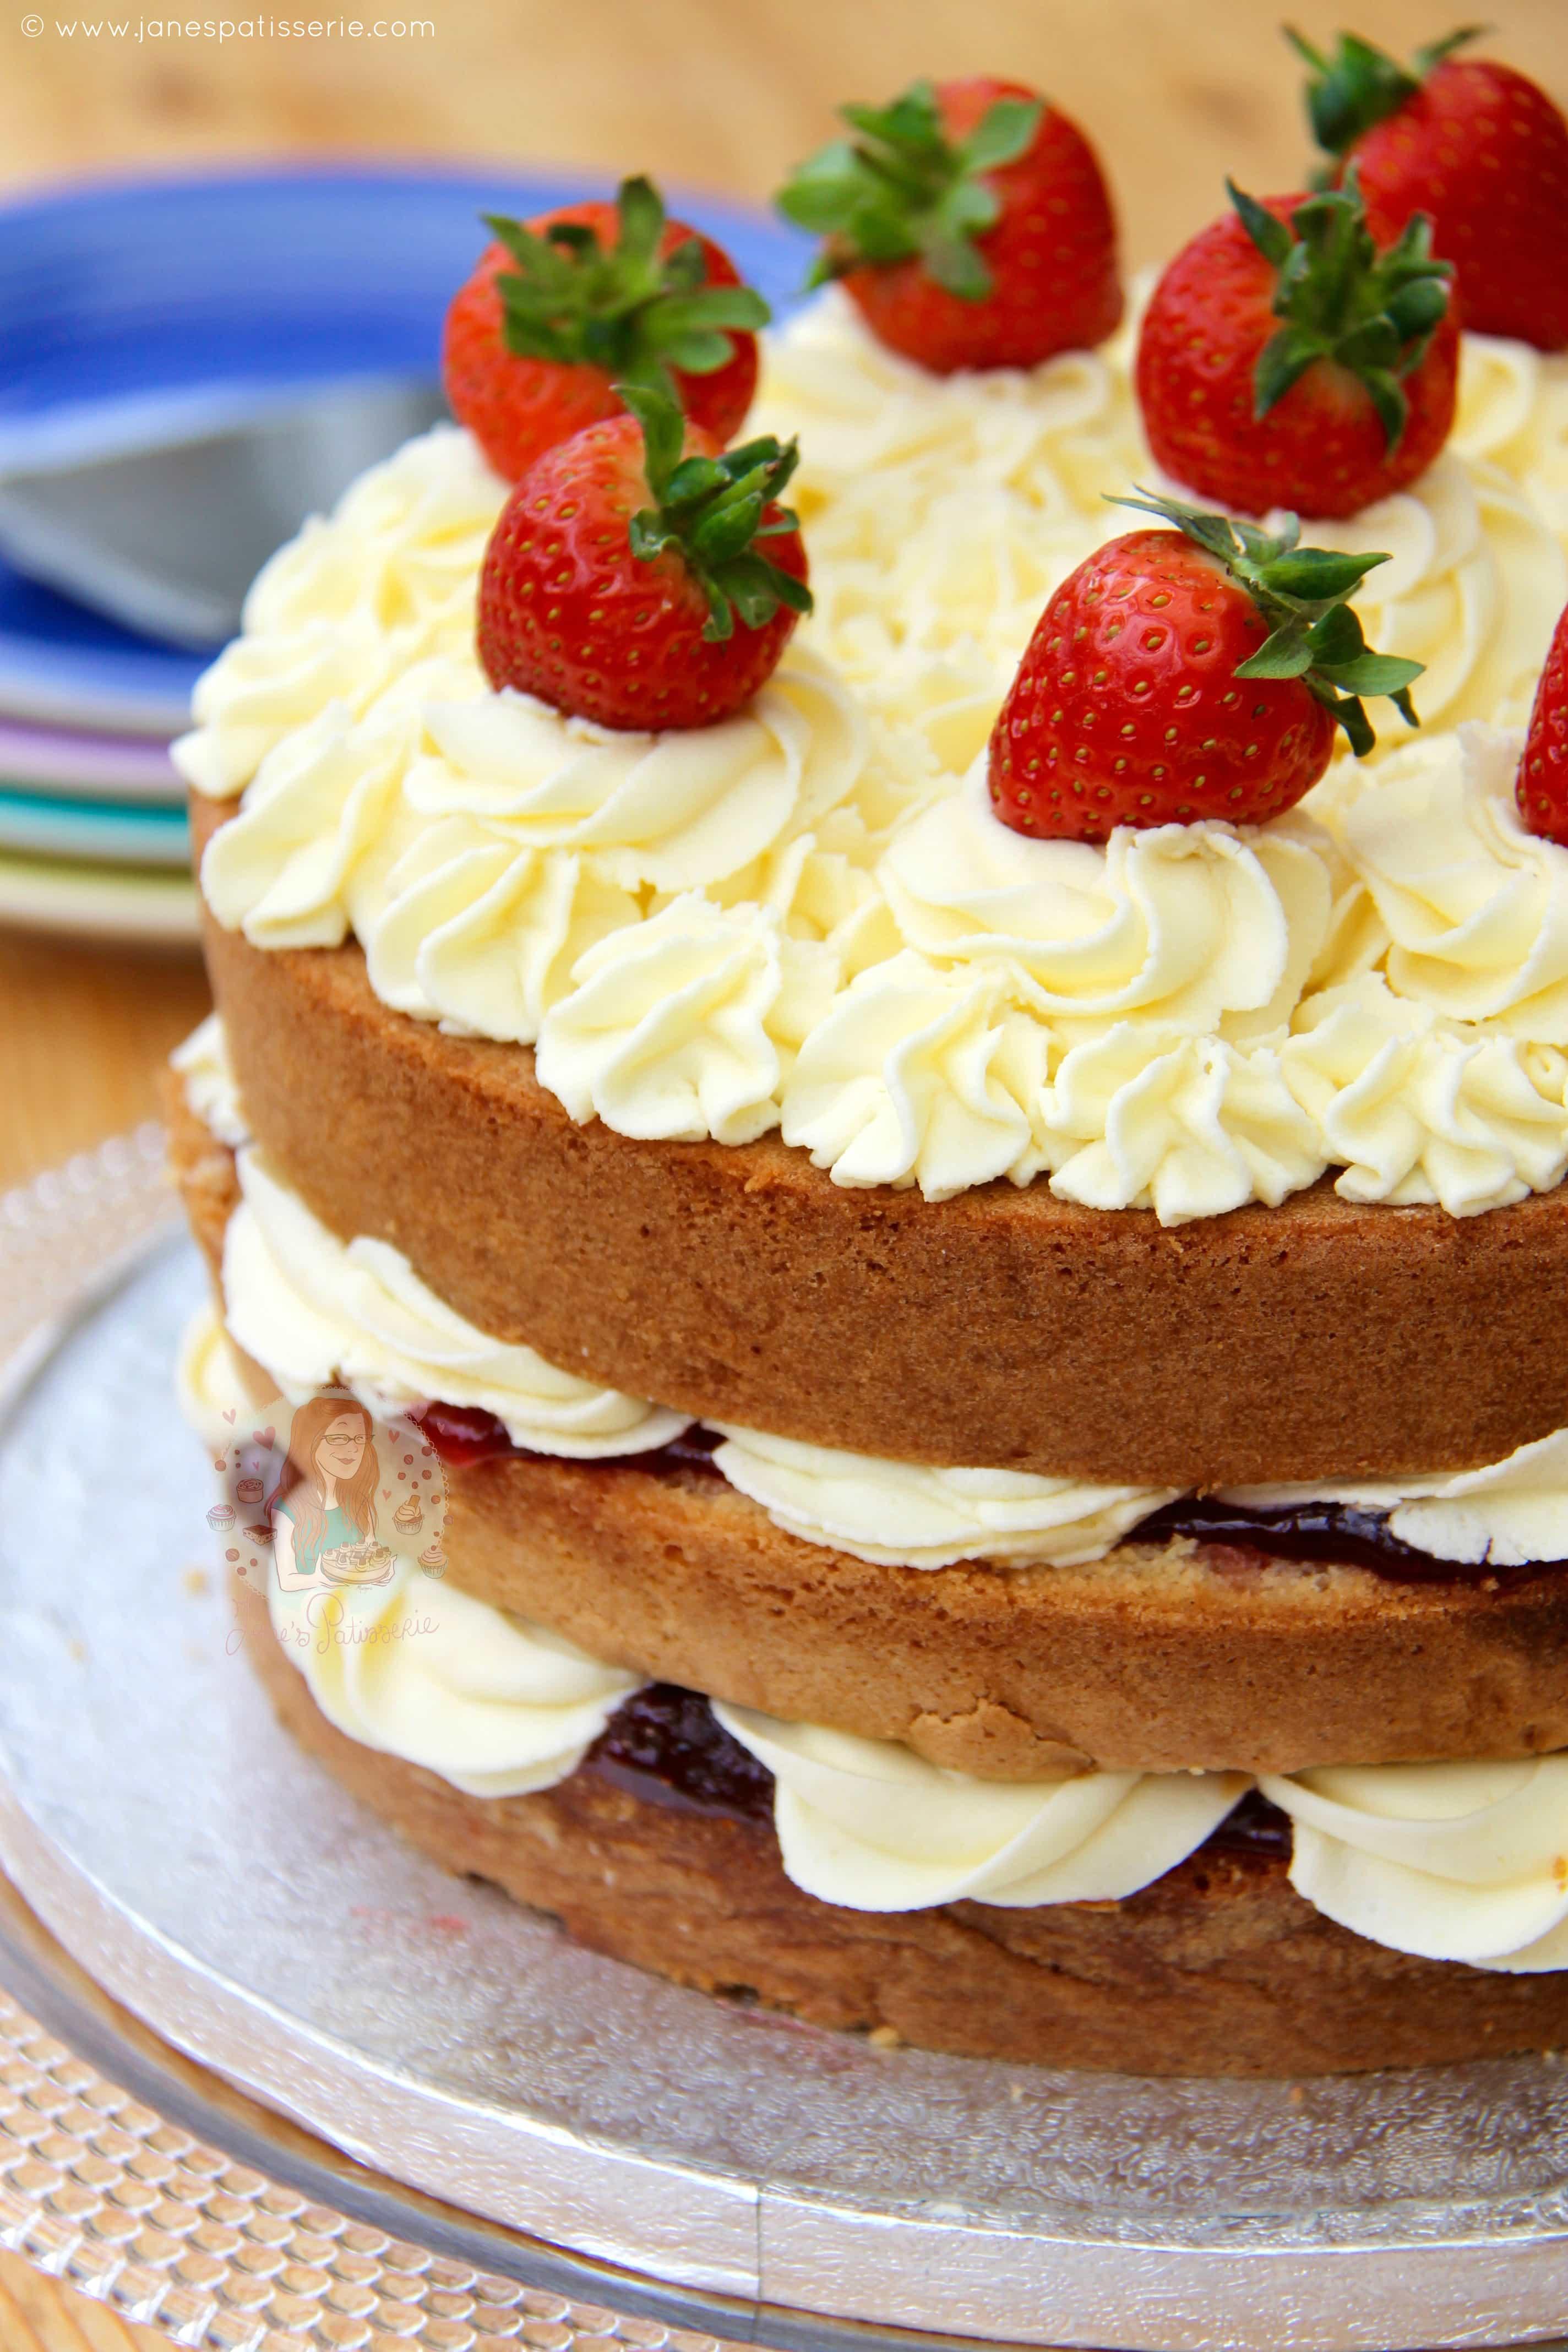 Pleasing Victoria Sponge Celebration Cake Janes Patisserie Personalised Birthday Cards Arneslily Jamesorg